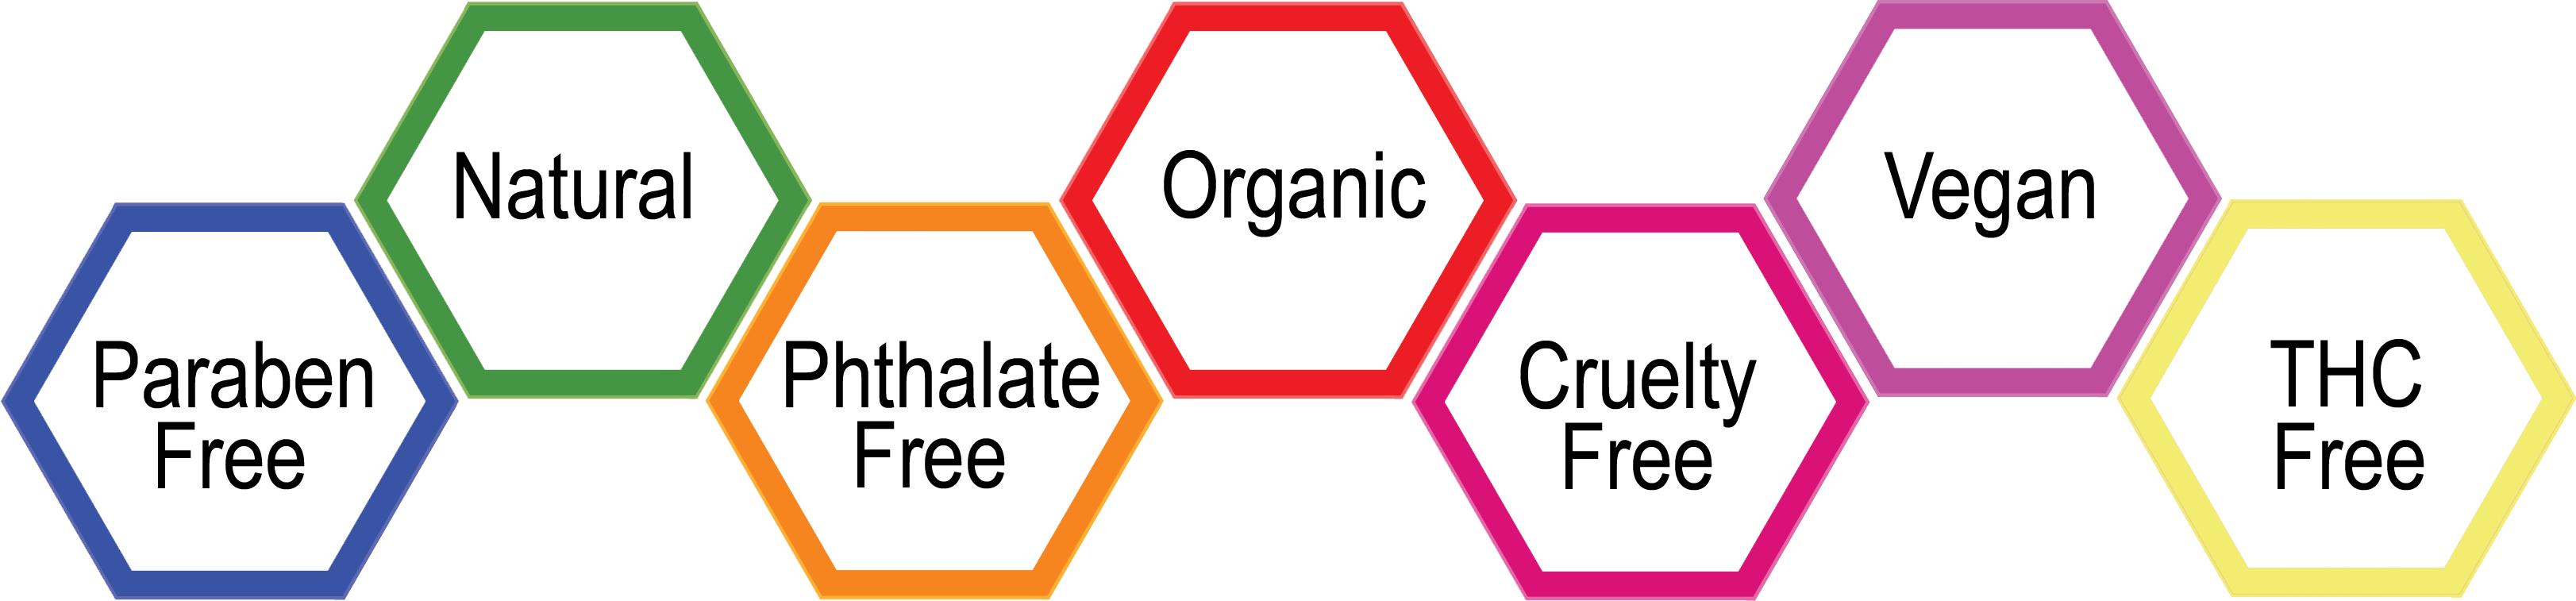 honeycombs-for-dewbee.png